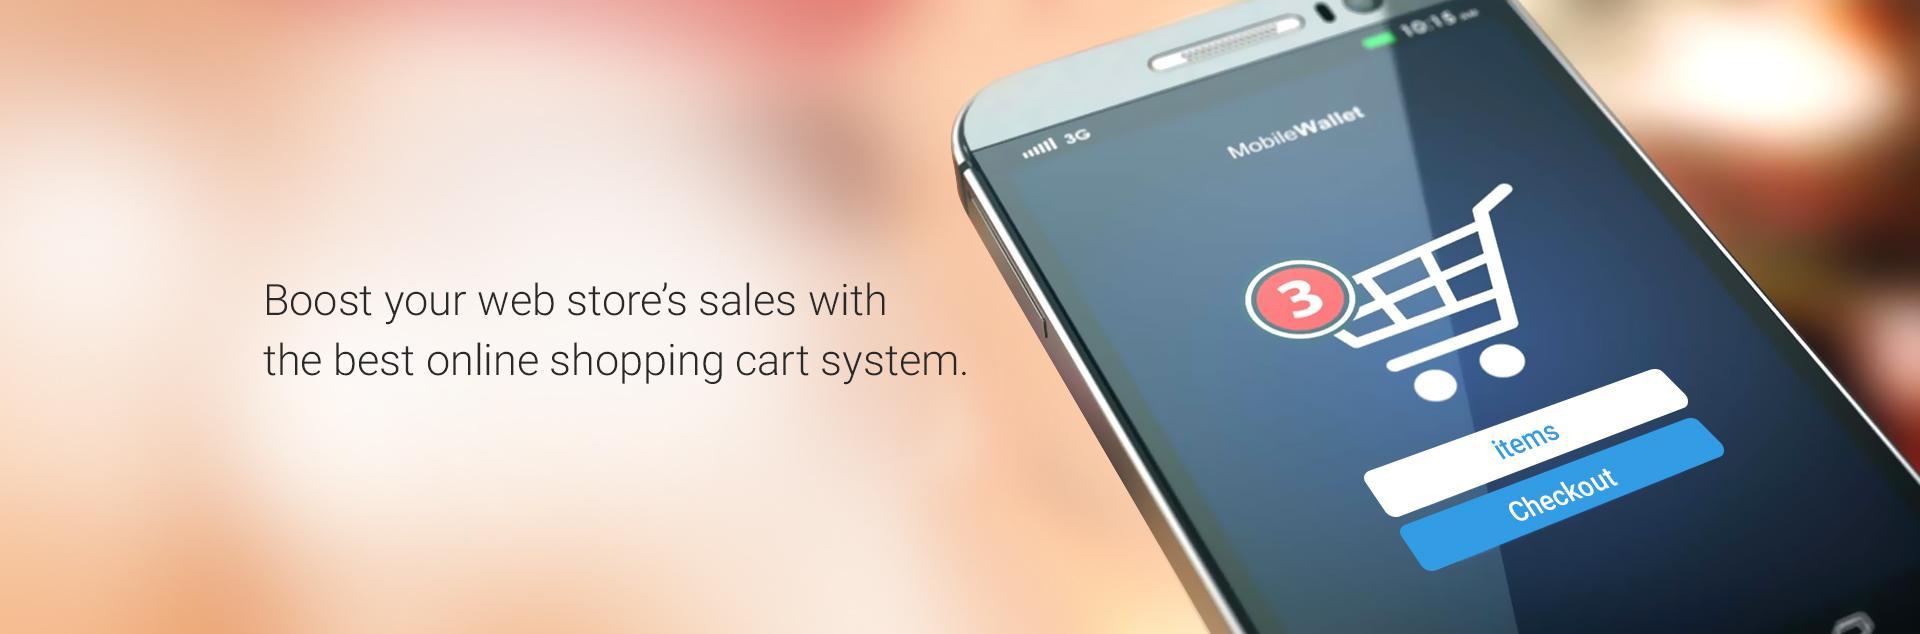 Online shopping cart system